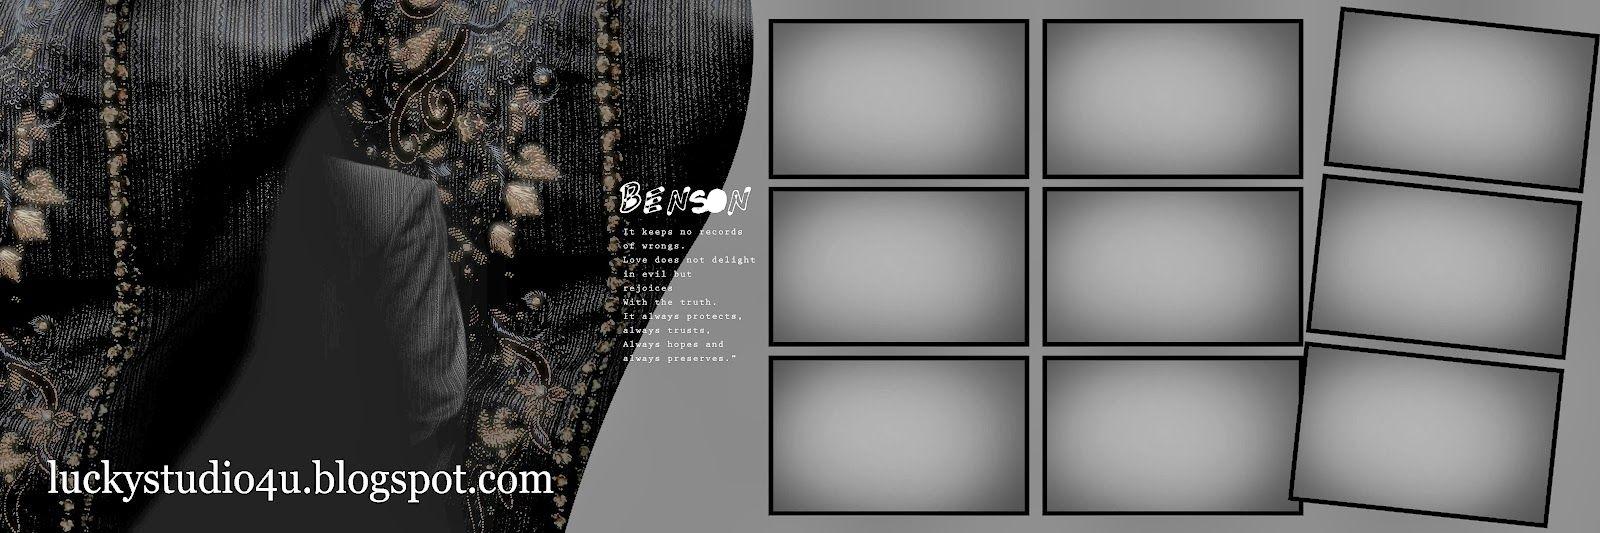 Karizma album hd joy studio design gallery best design - Karizma Album Background Psd Files Free Download 12x36 Collection Studiopk Pinterest Weddings